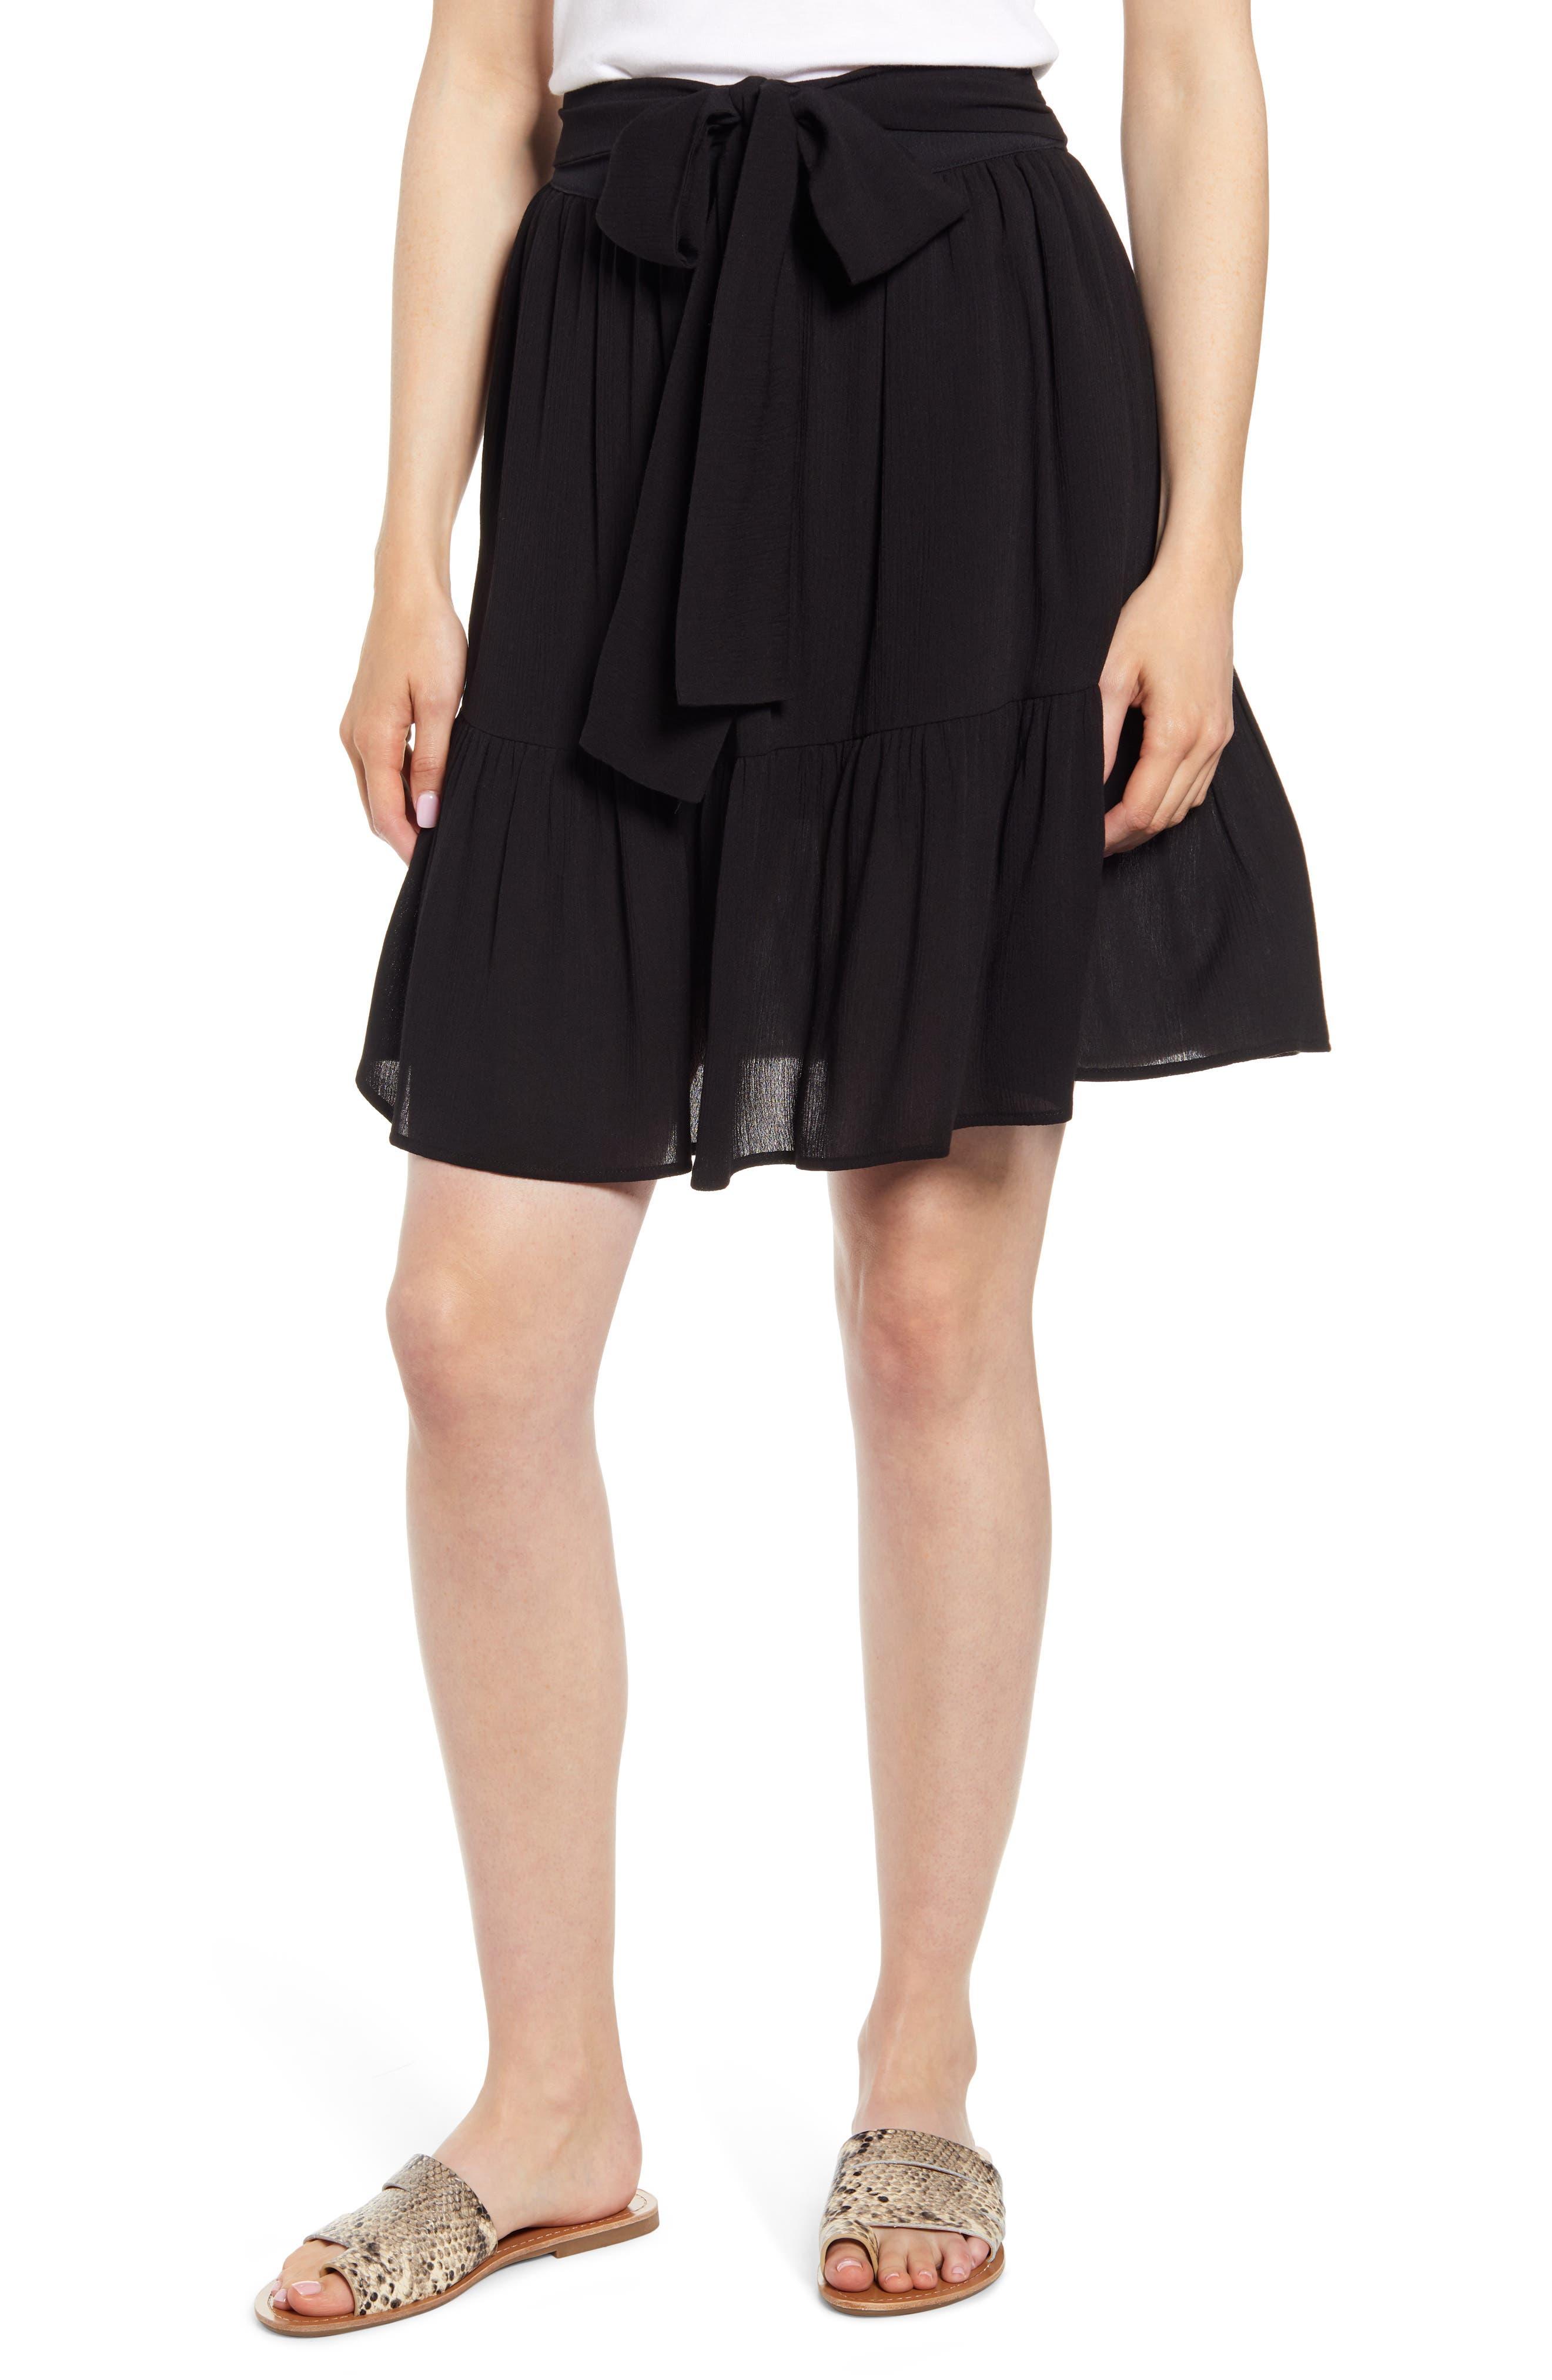 Petite Gibson X Hi Sugarplum! Capri Tiered Tie Front Summer Skirt, Black